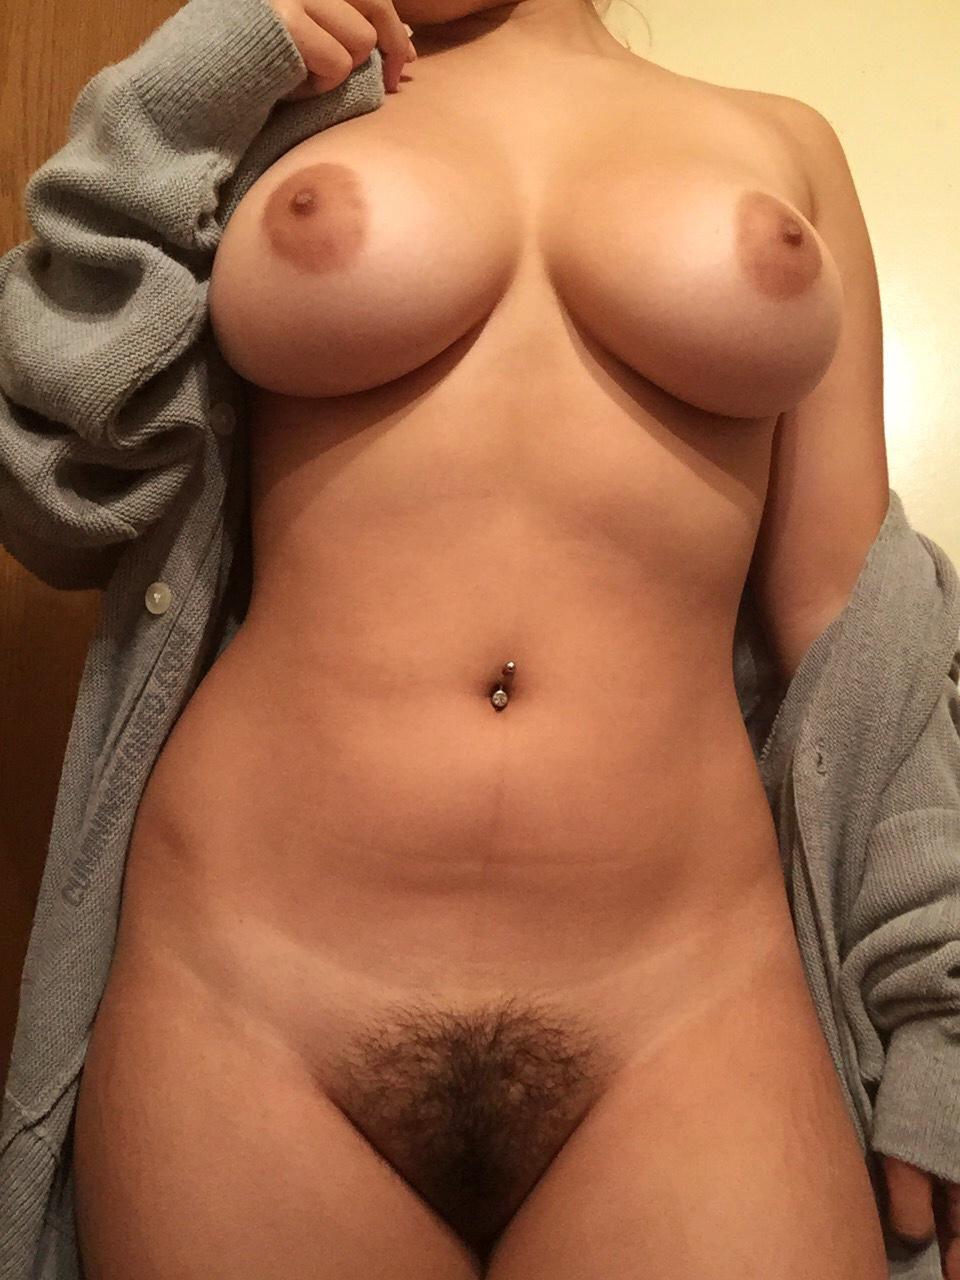 unshaved porn